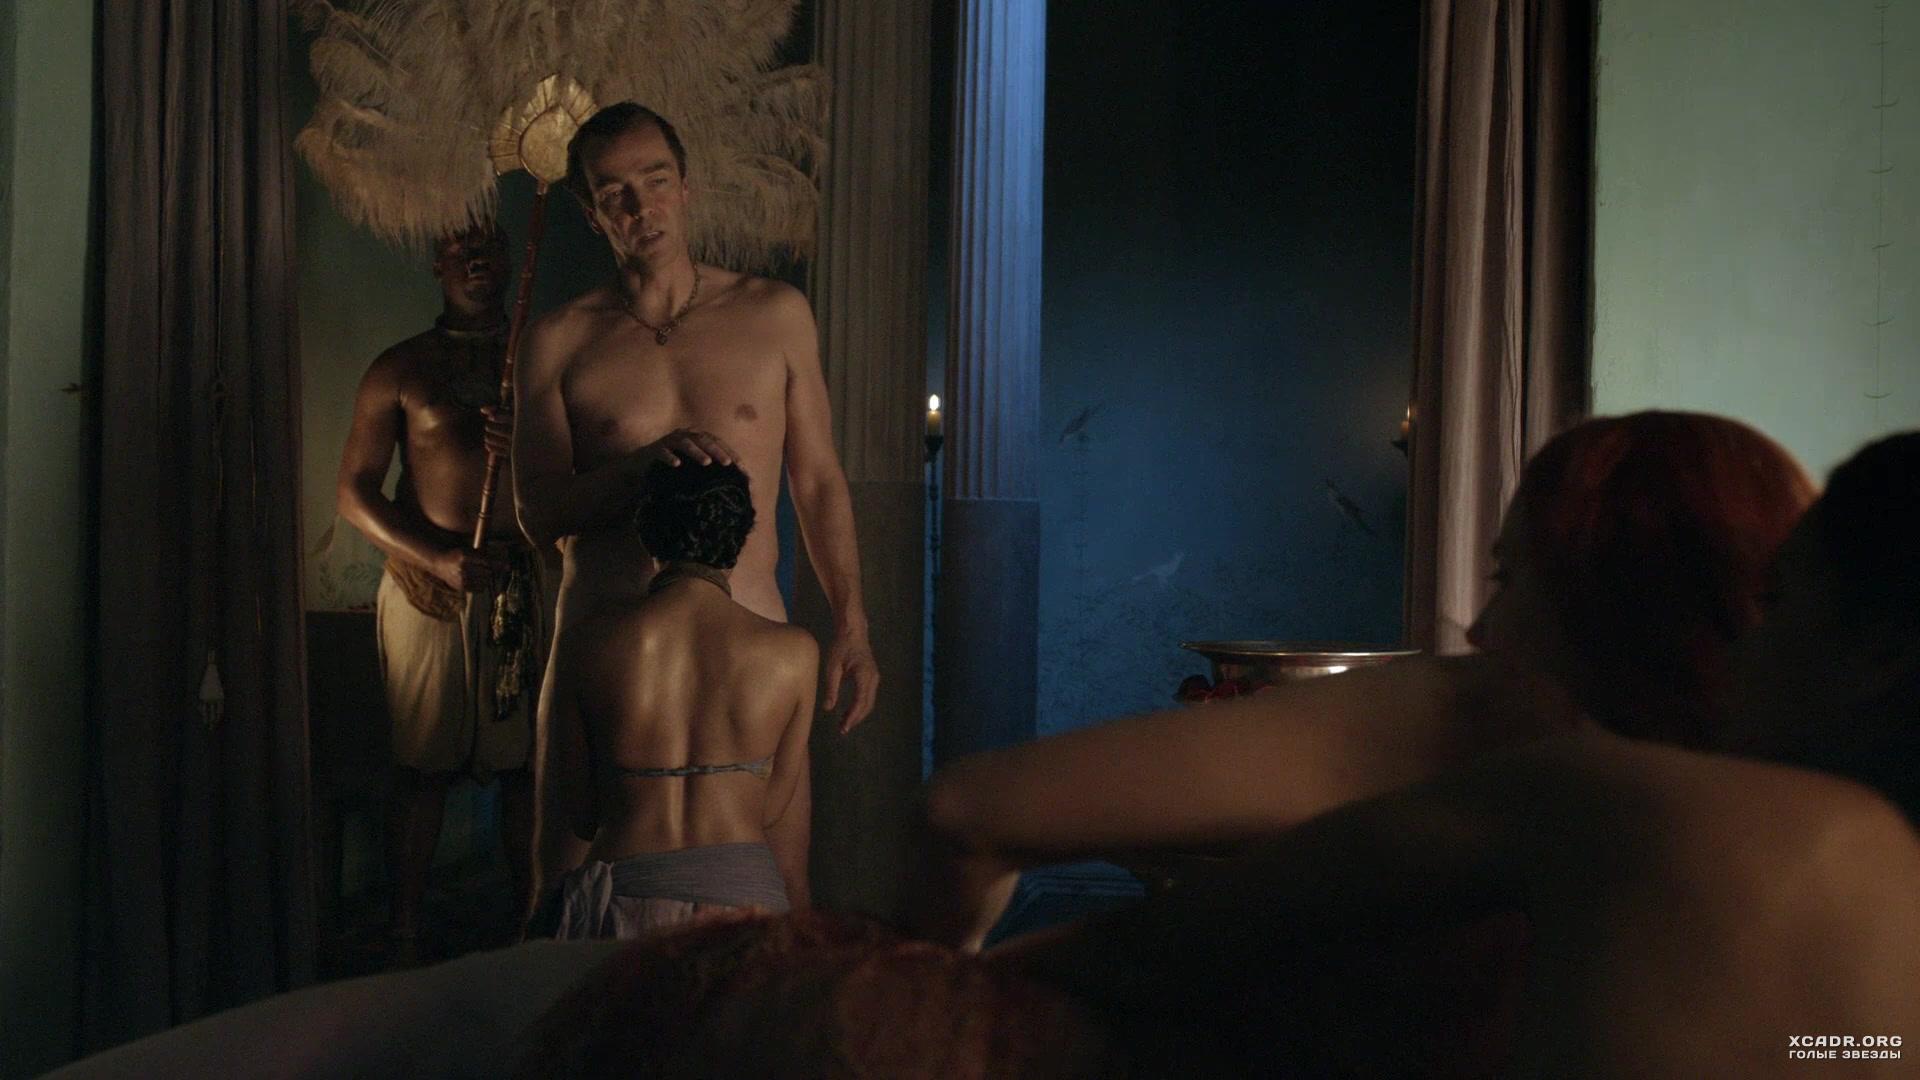 Секс видео из фильма спартак